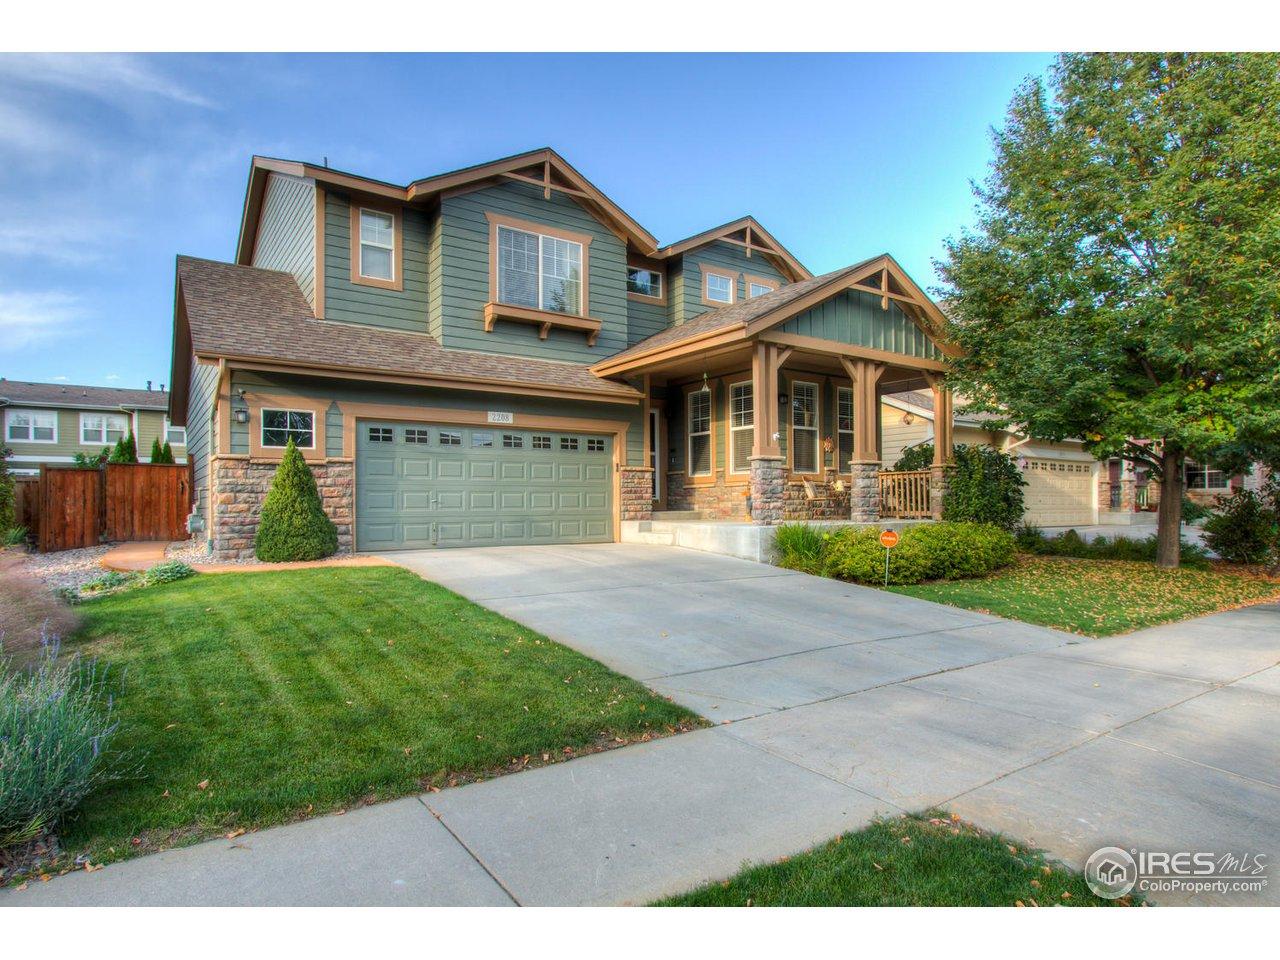 2208 Chandler St, Fort Collins CO 80528